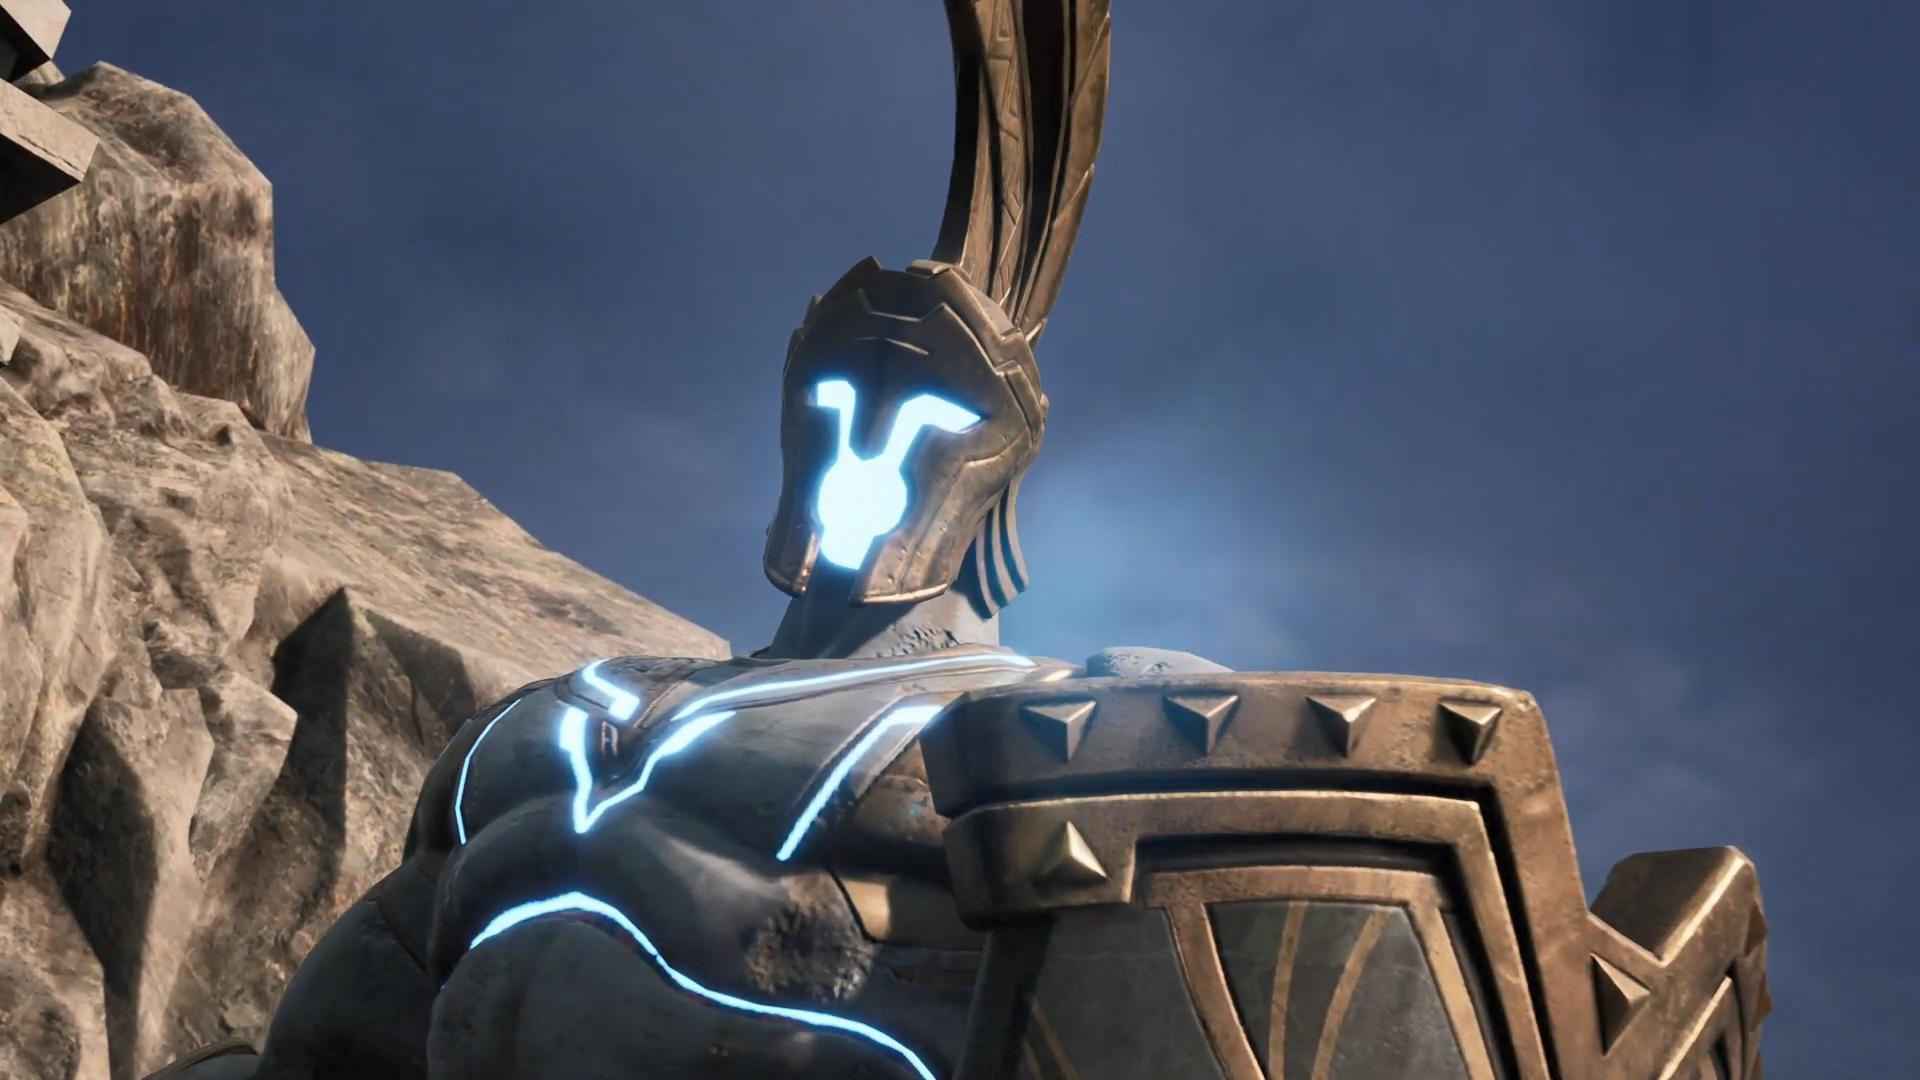 ARPG新作《Asterigos》公布官方预告片 2022年发售插图11